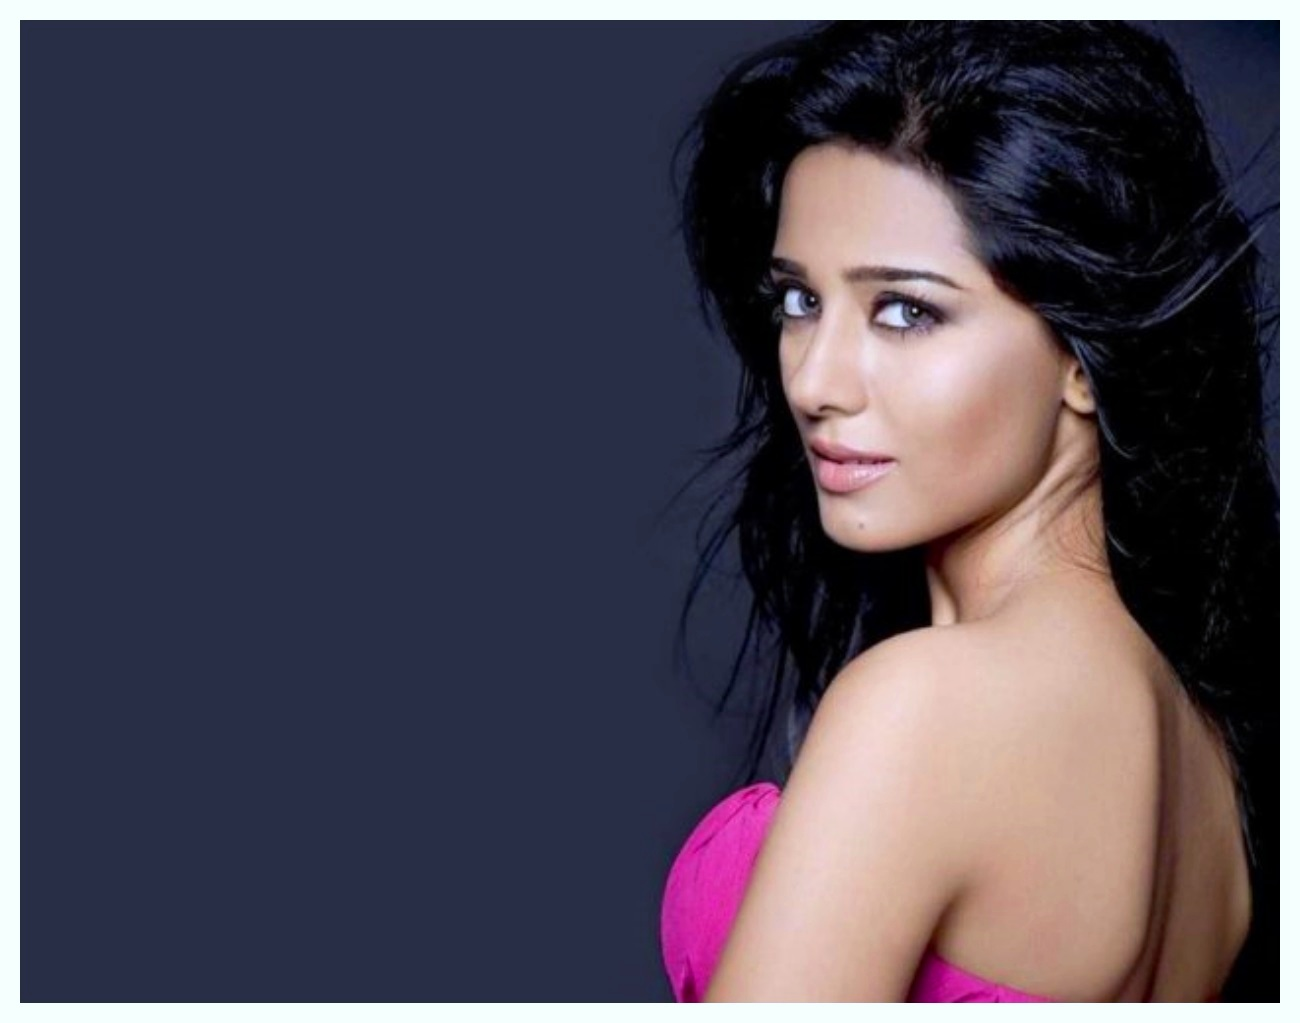 Amrita Rao Hot and innocent images